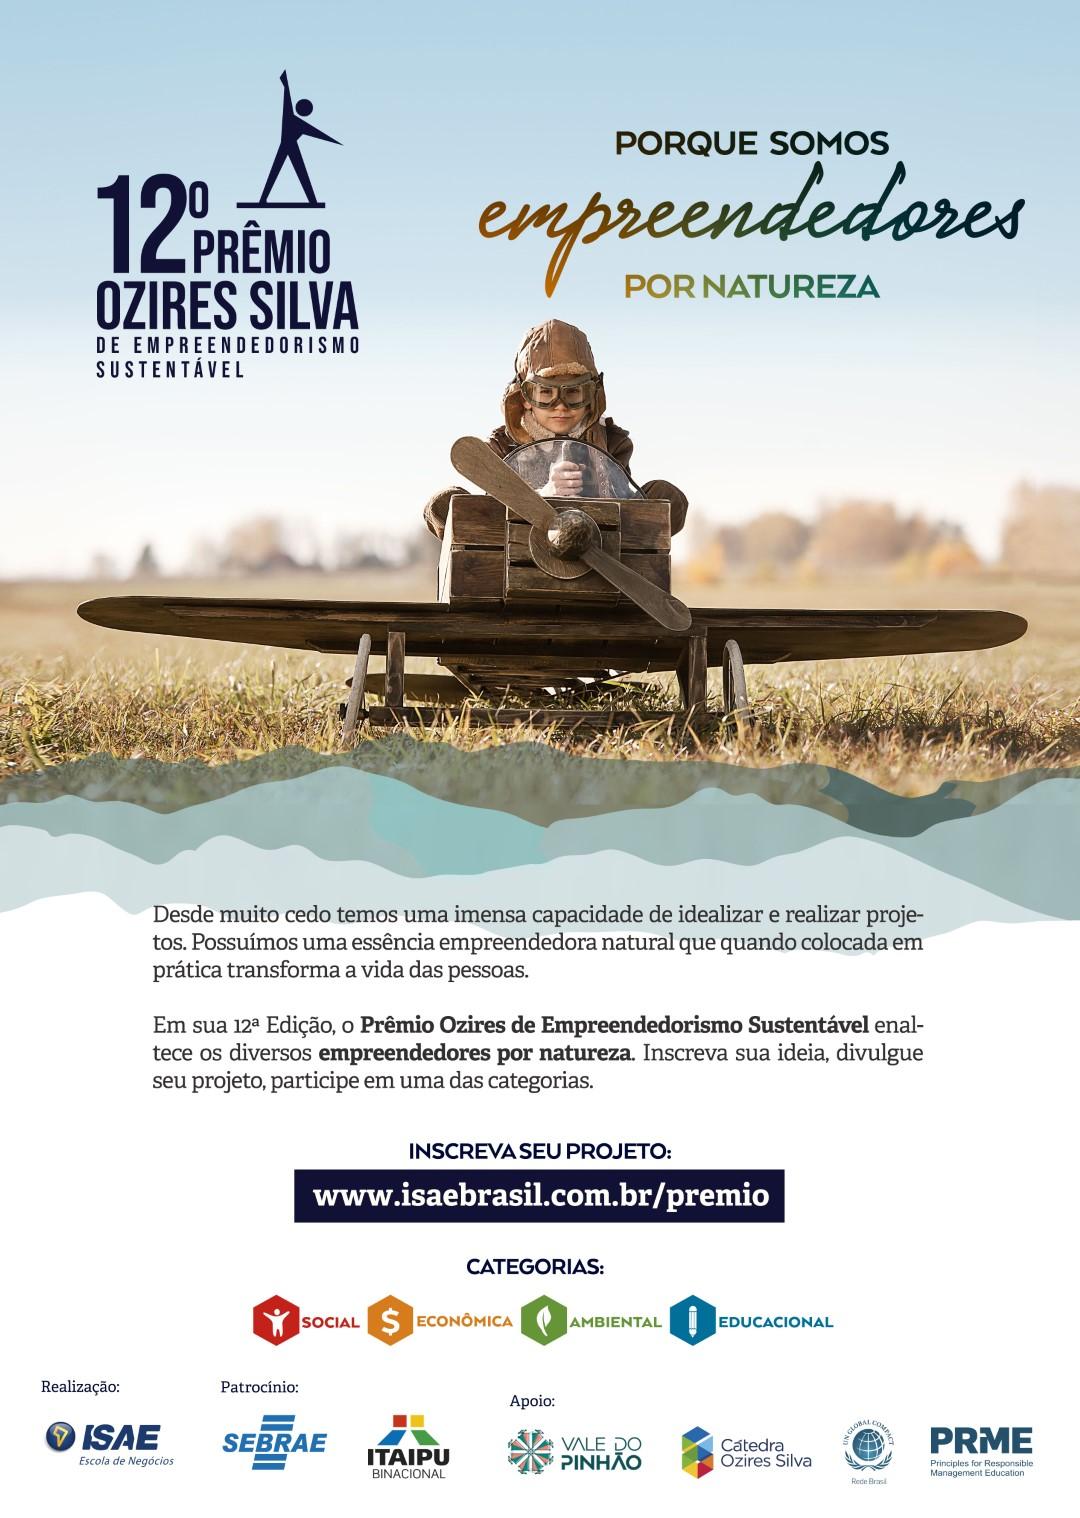 ozires silva cartaz 22 11 2018